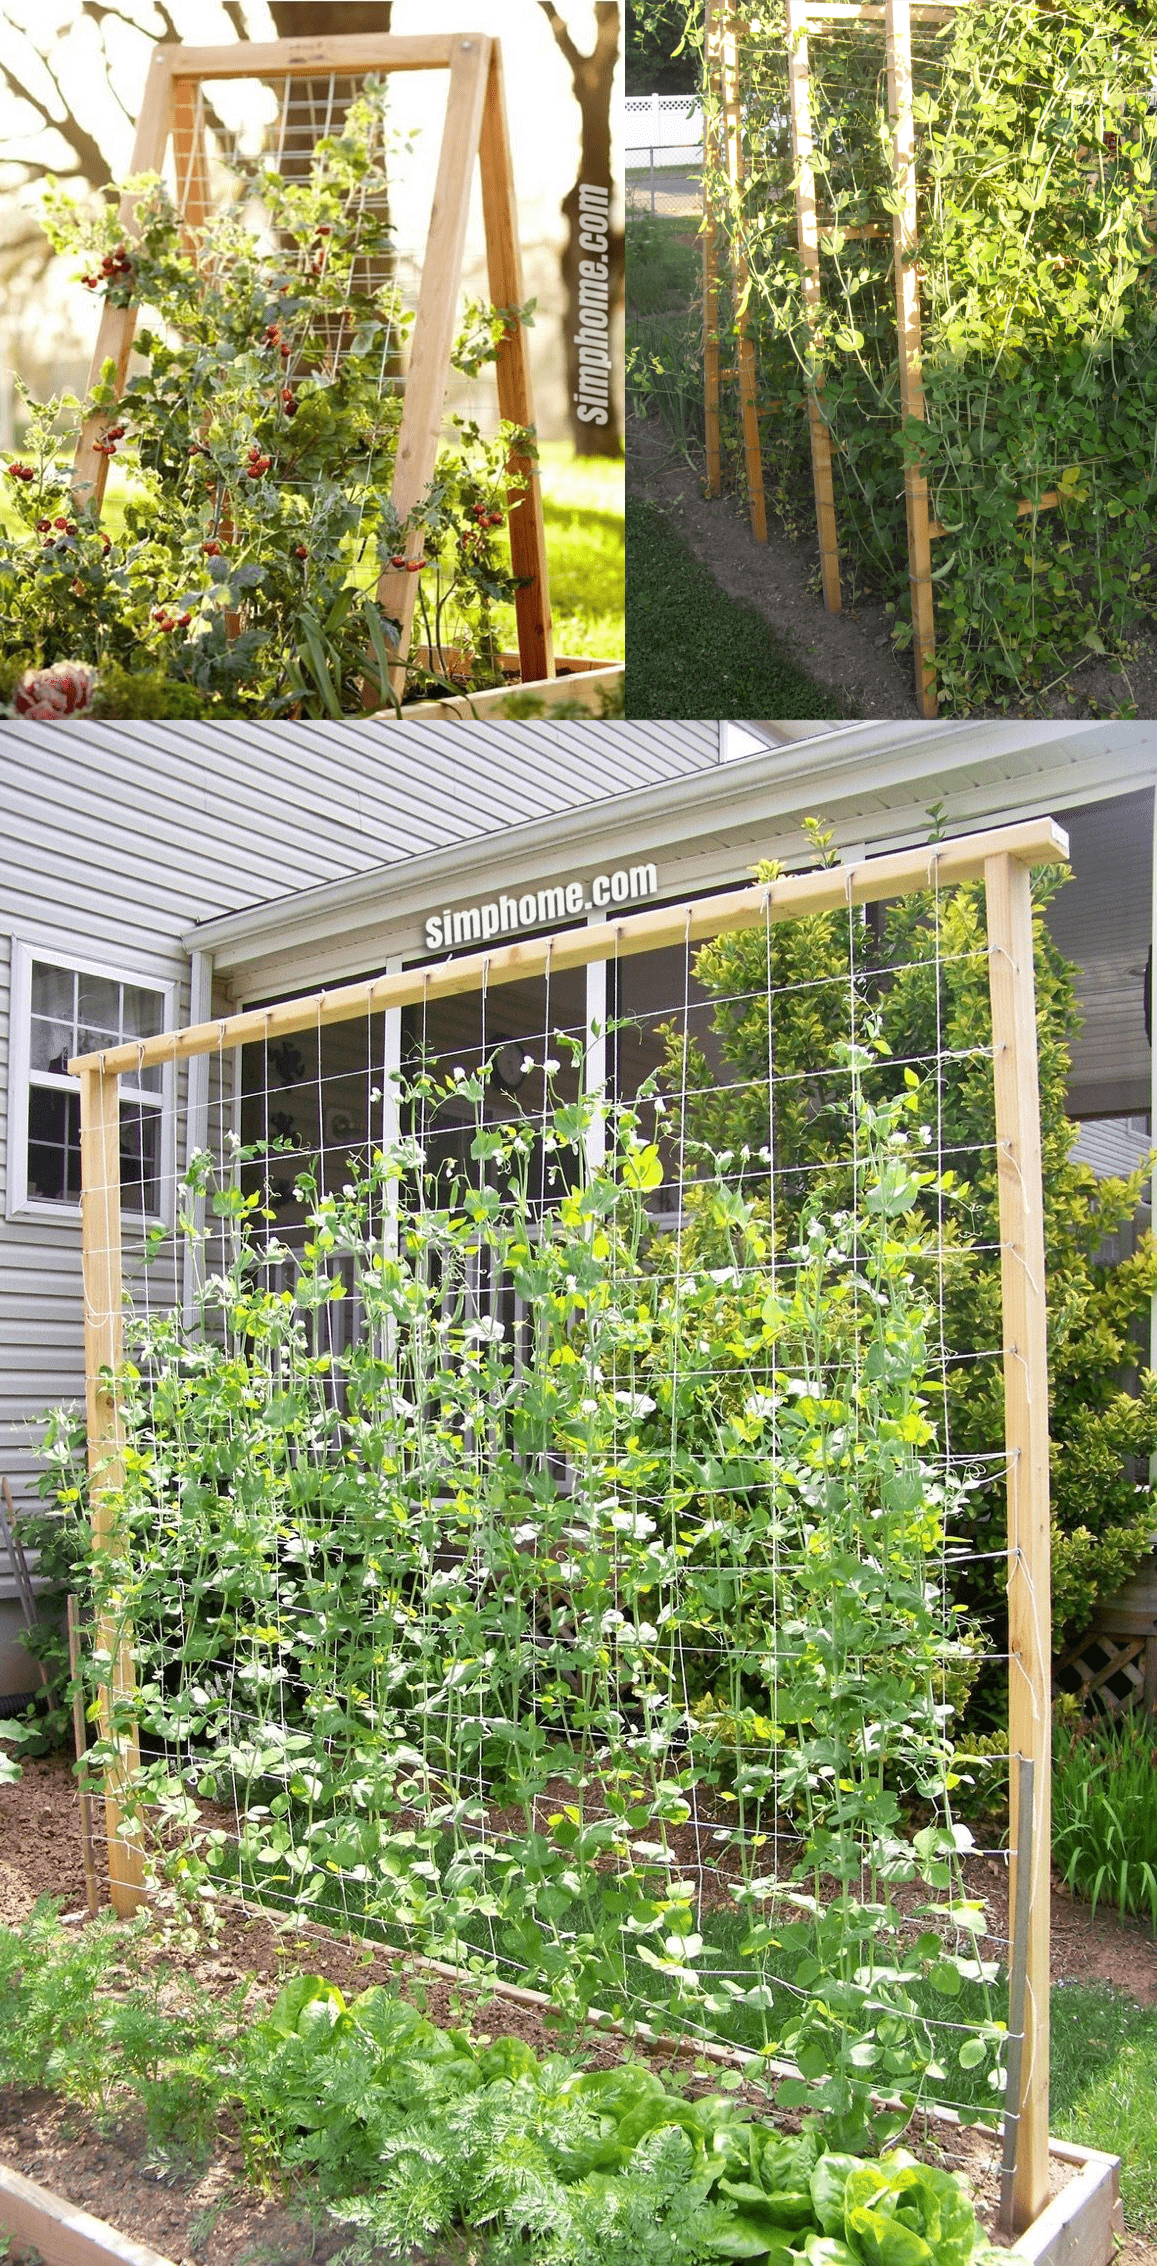 10 Vegetable Garden Trellis Ideas in 2020